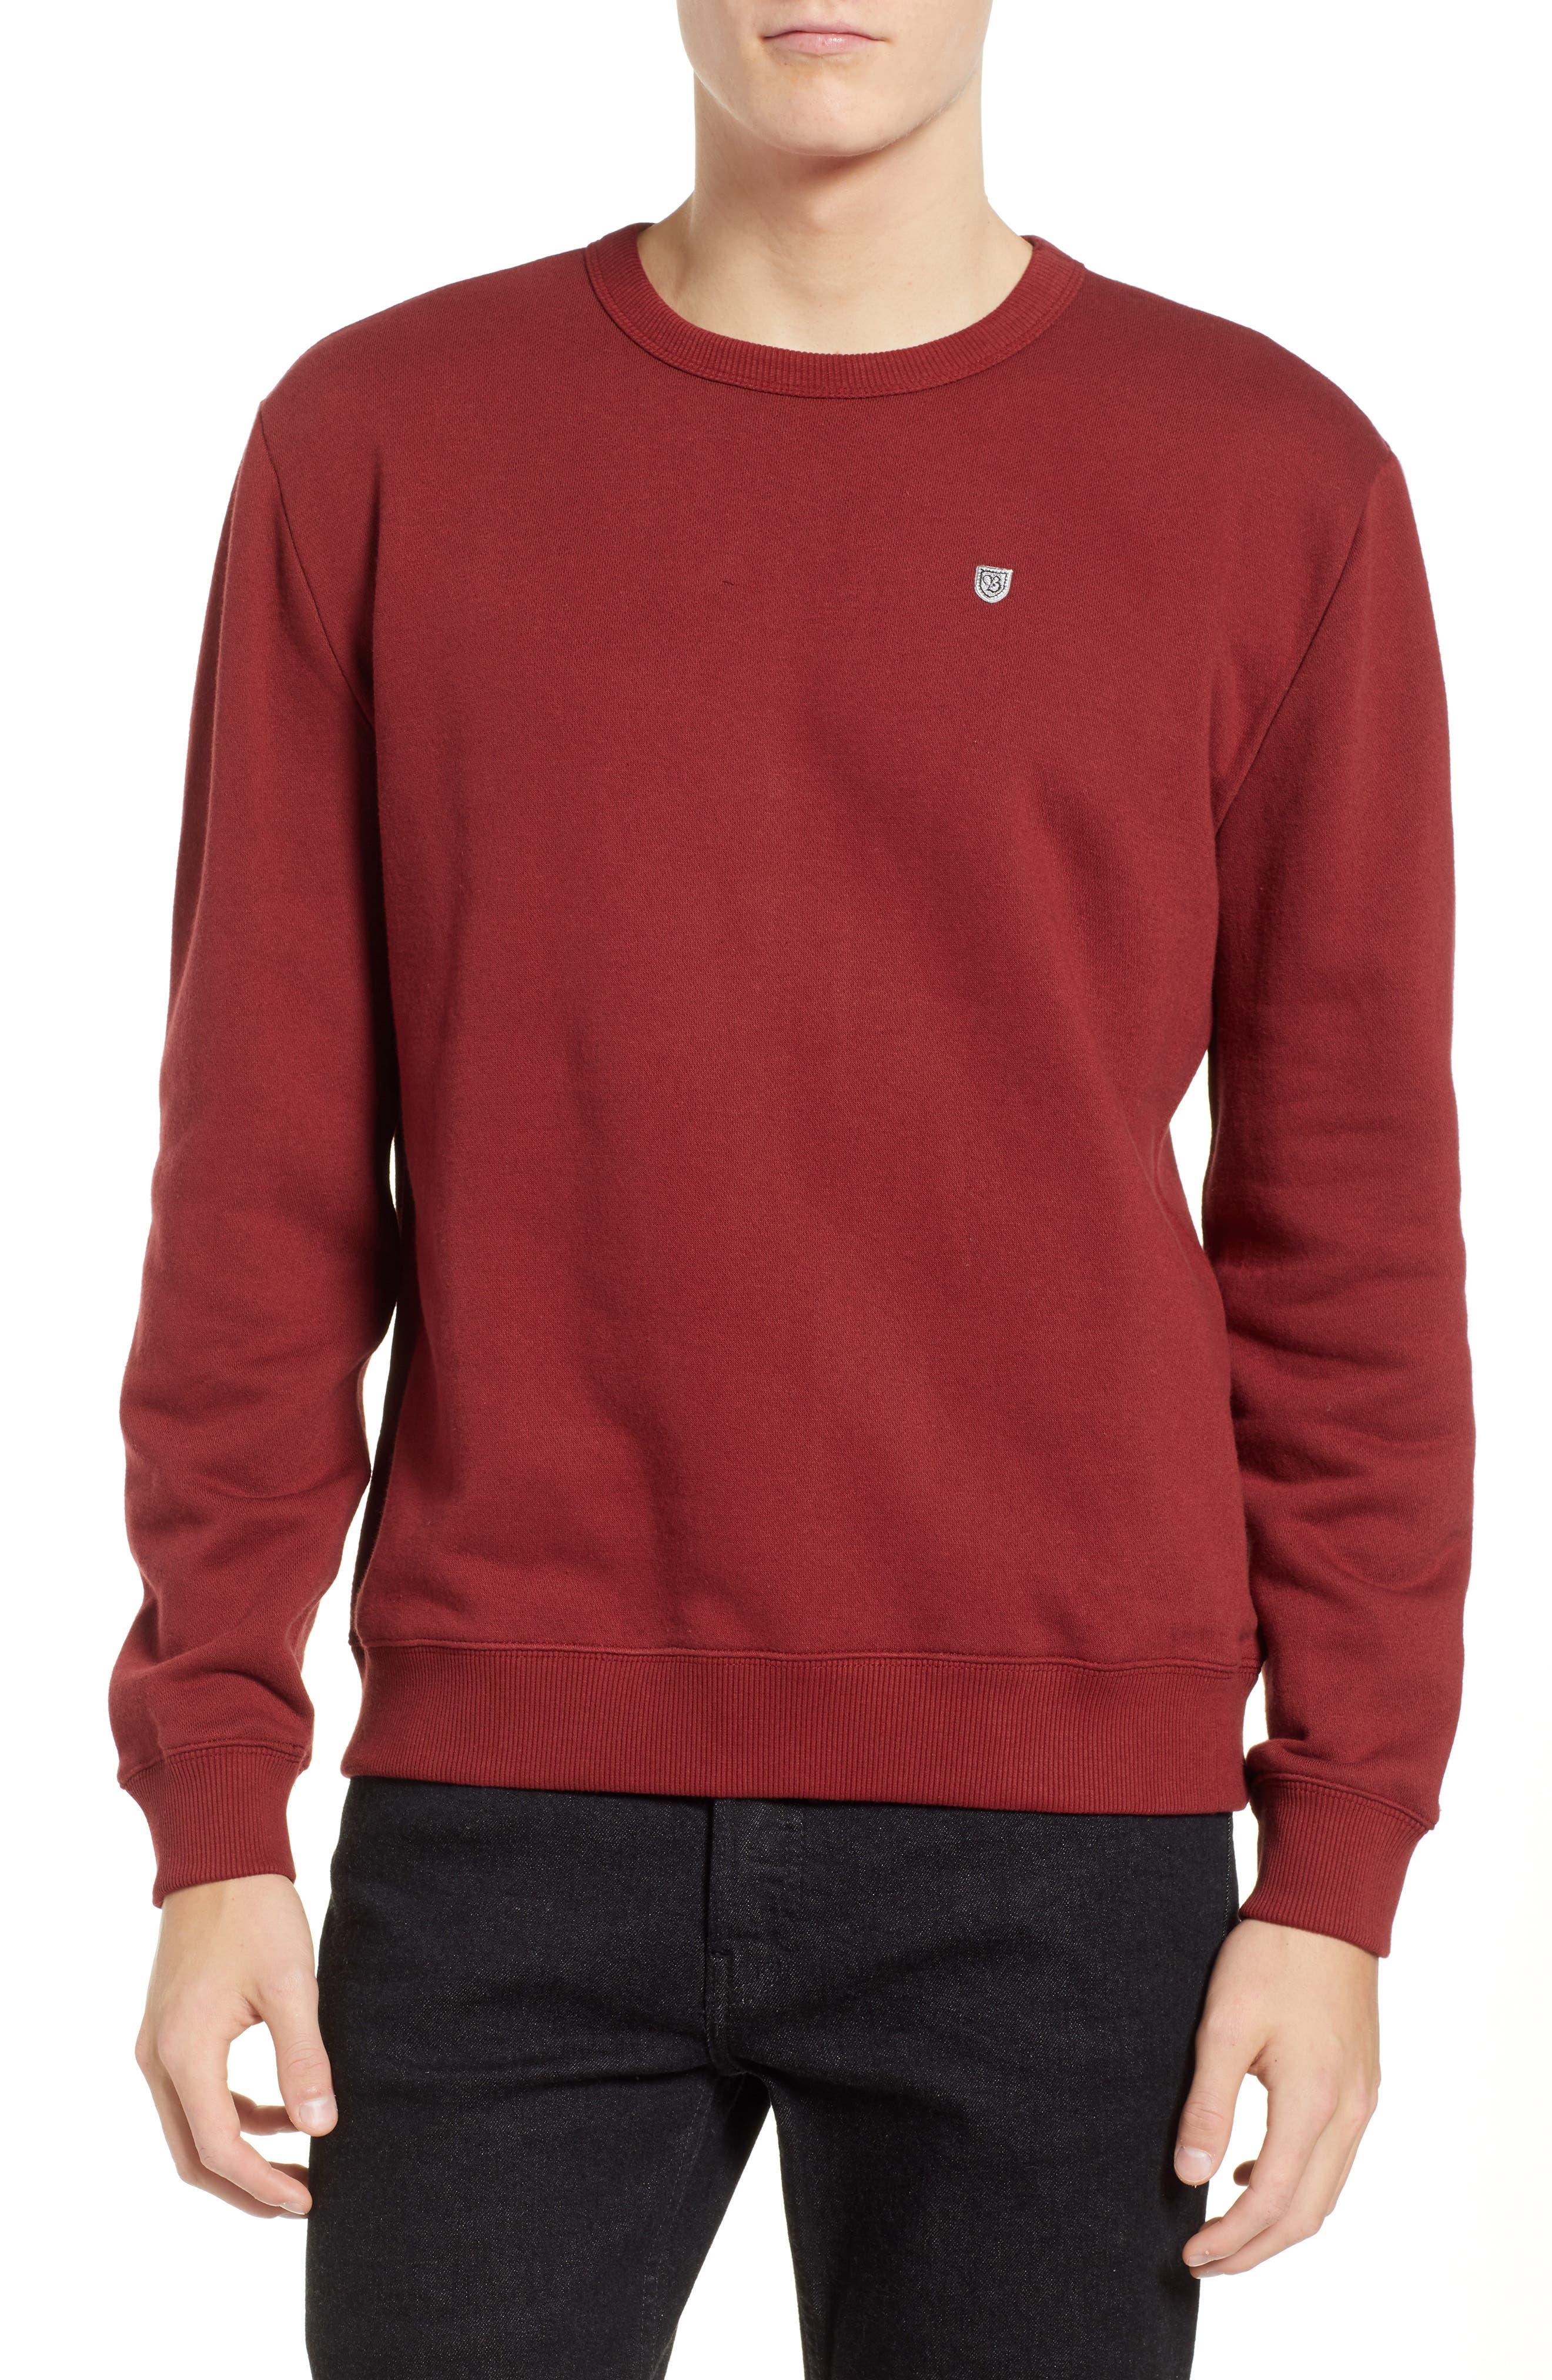 B-Shield Appliqué Crewneck Sweatshirt,                             Main thumbnail 1, color,                             RED